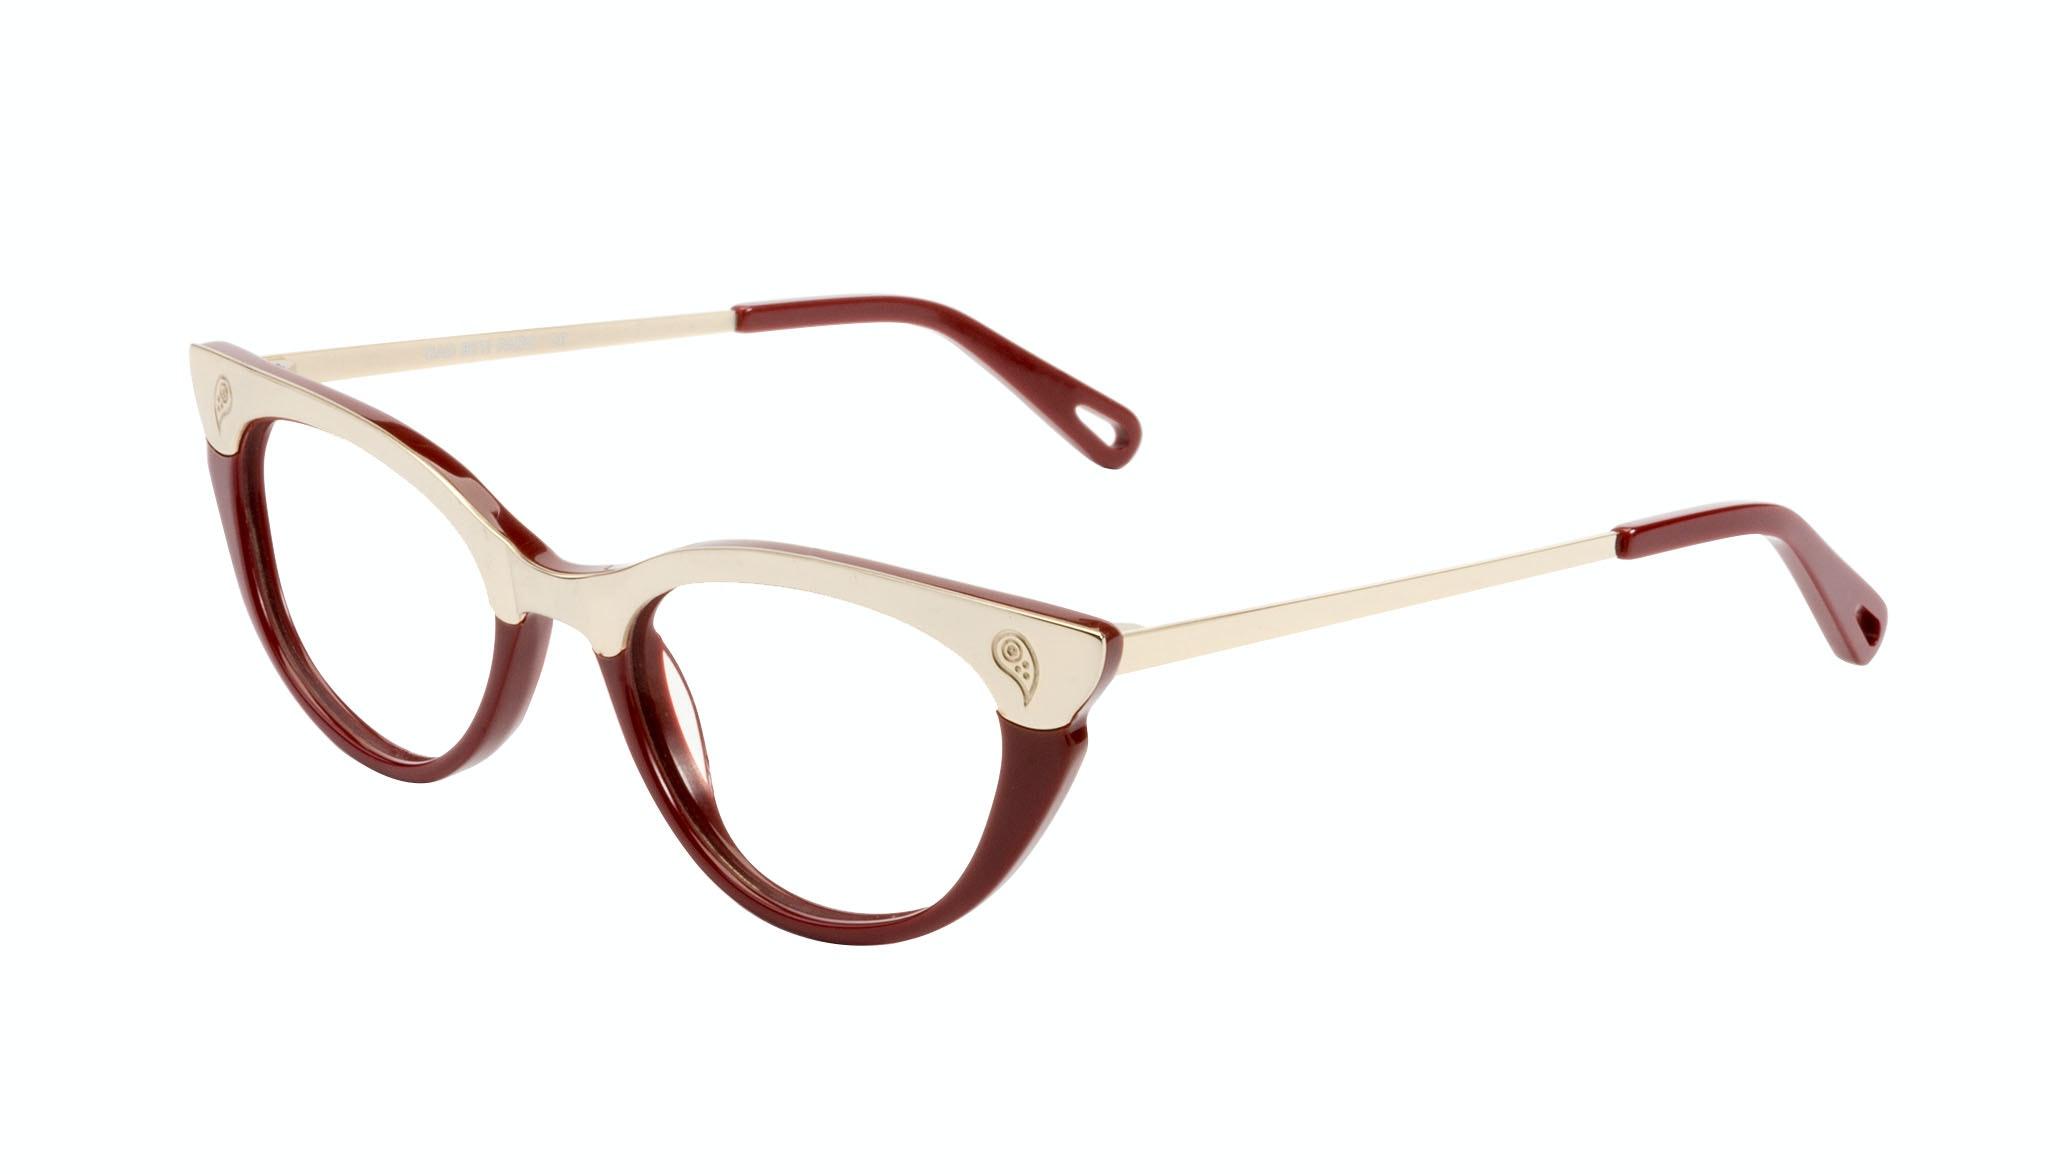 Affordable Fashion Glasses Cat Eye Daring Cateye Eyeglasses Women Bad Beti Paro Tilt